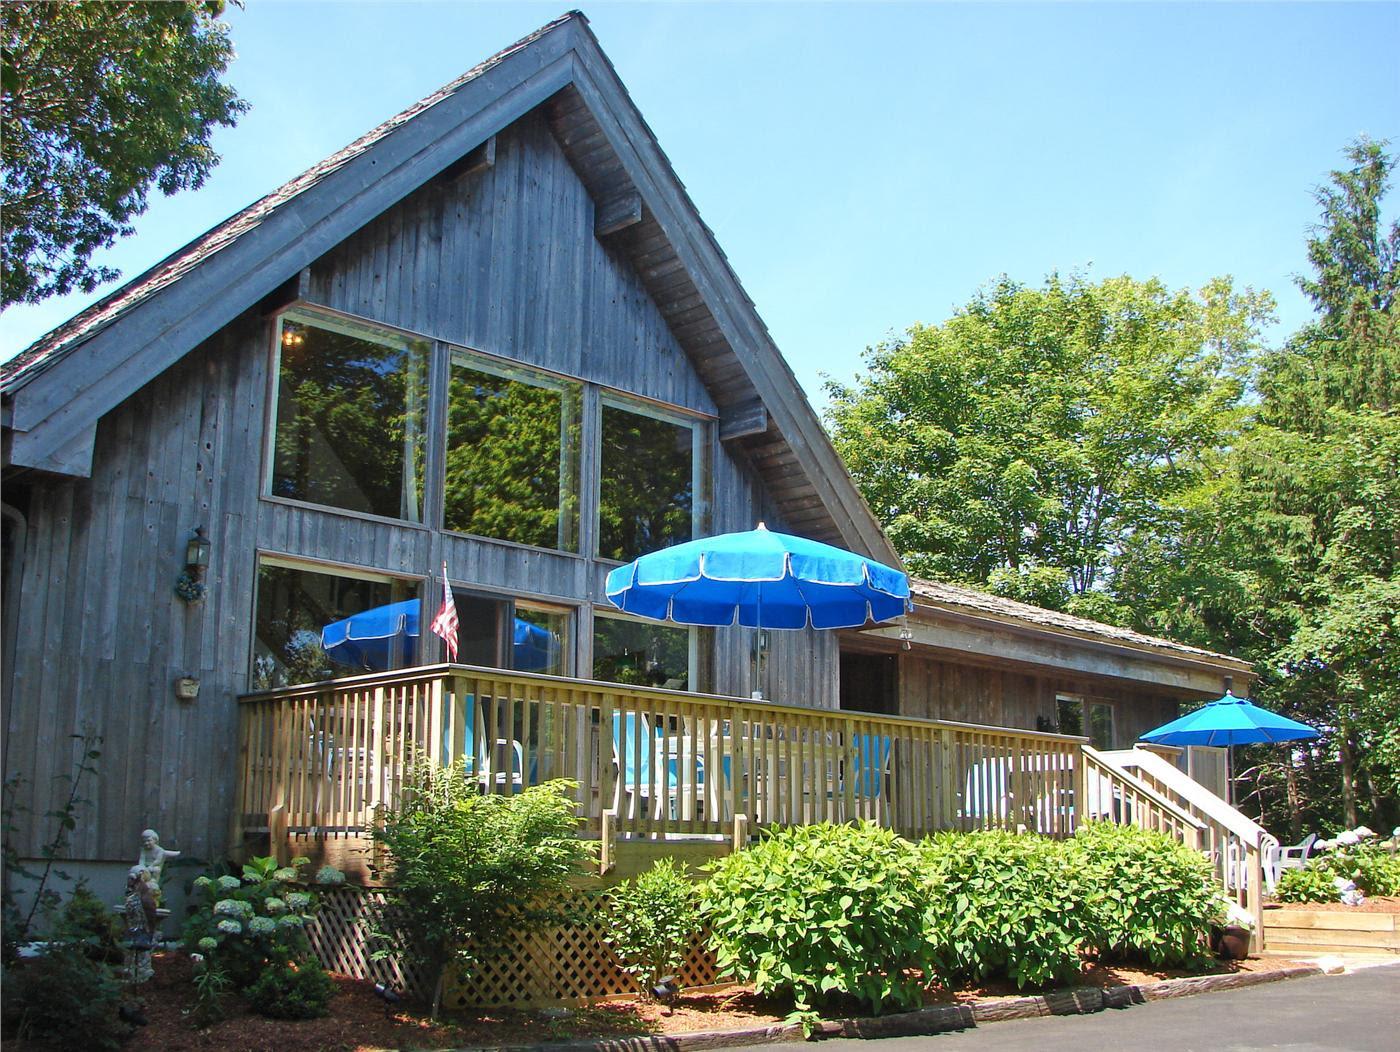 Wellfleet Vacation Rental home in Cape Cod MA 02667 5